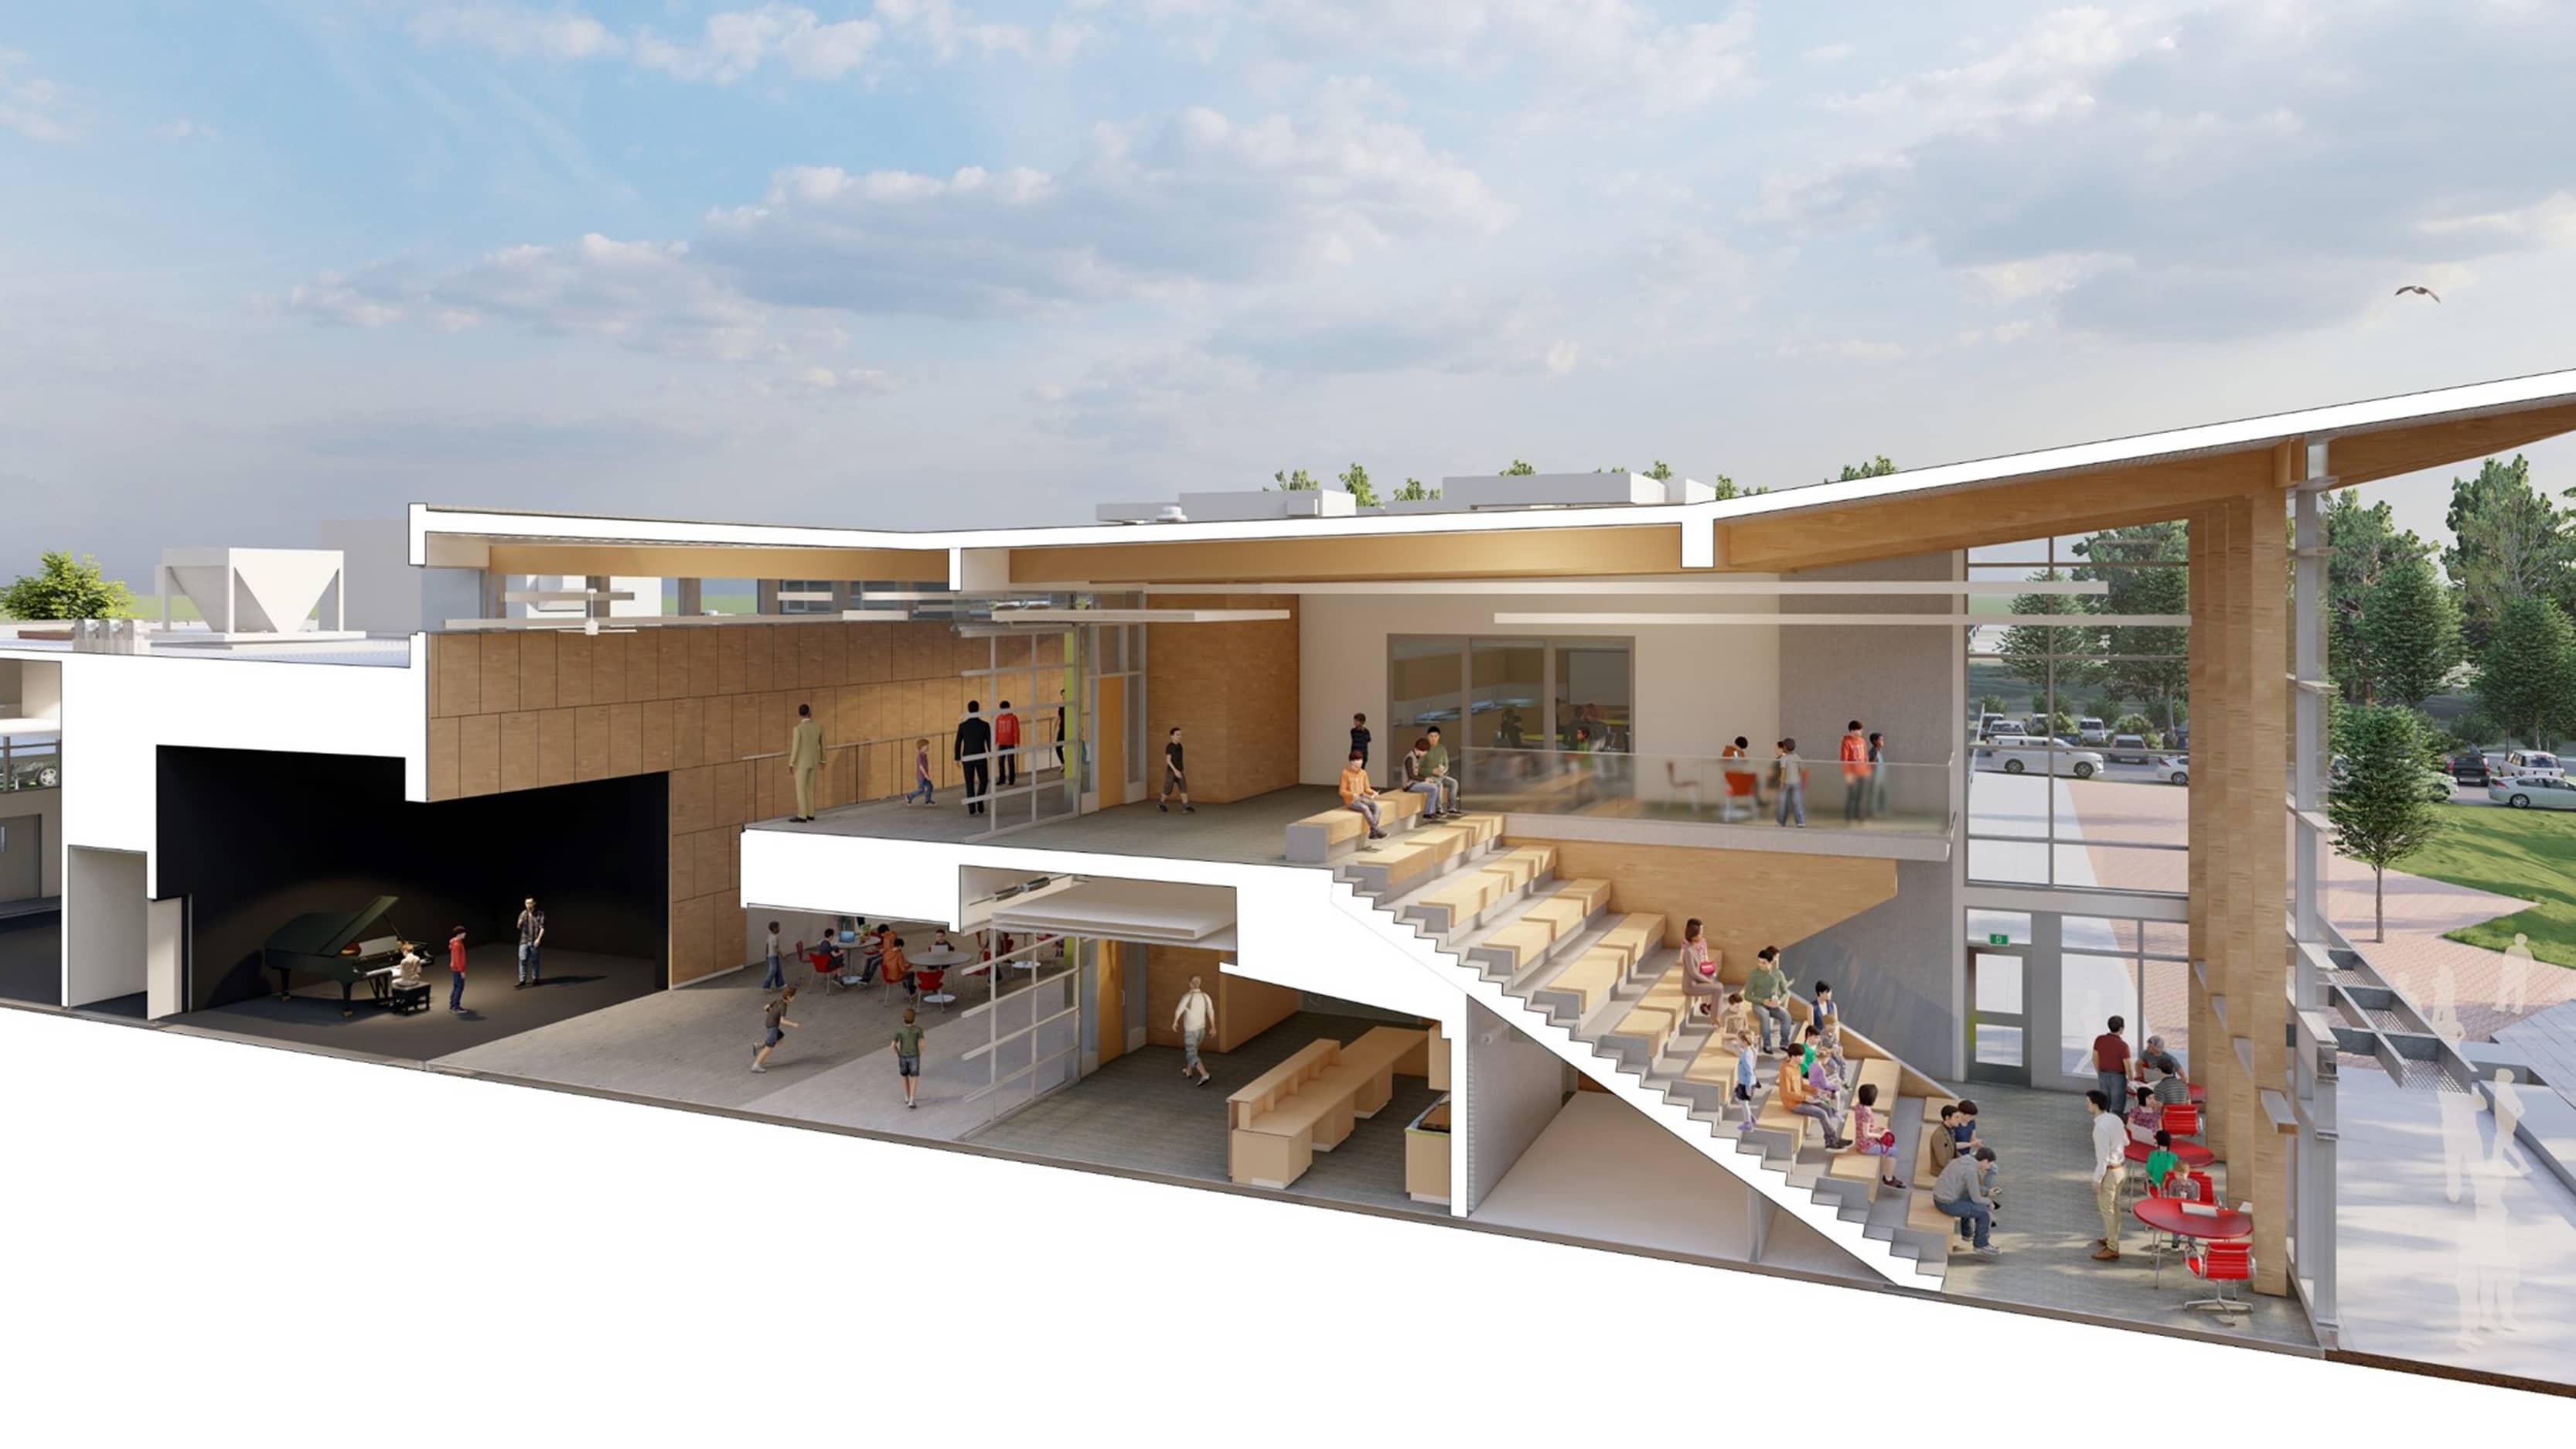 bbp southside elementary/middle school side view